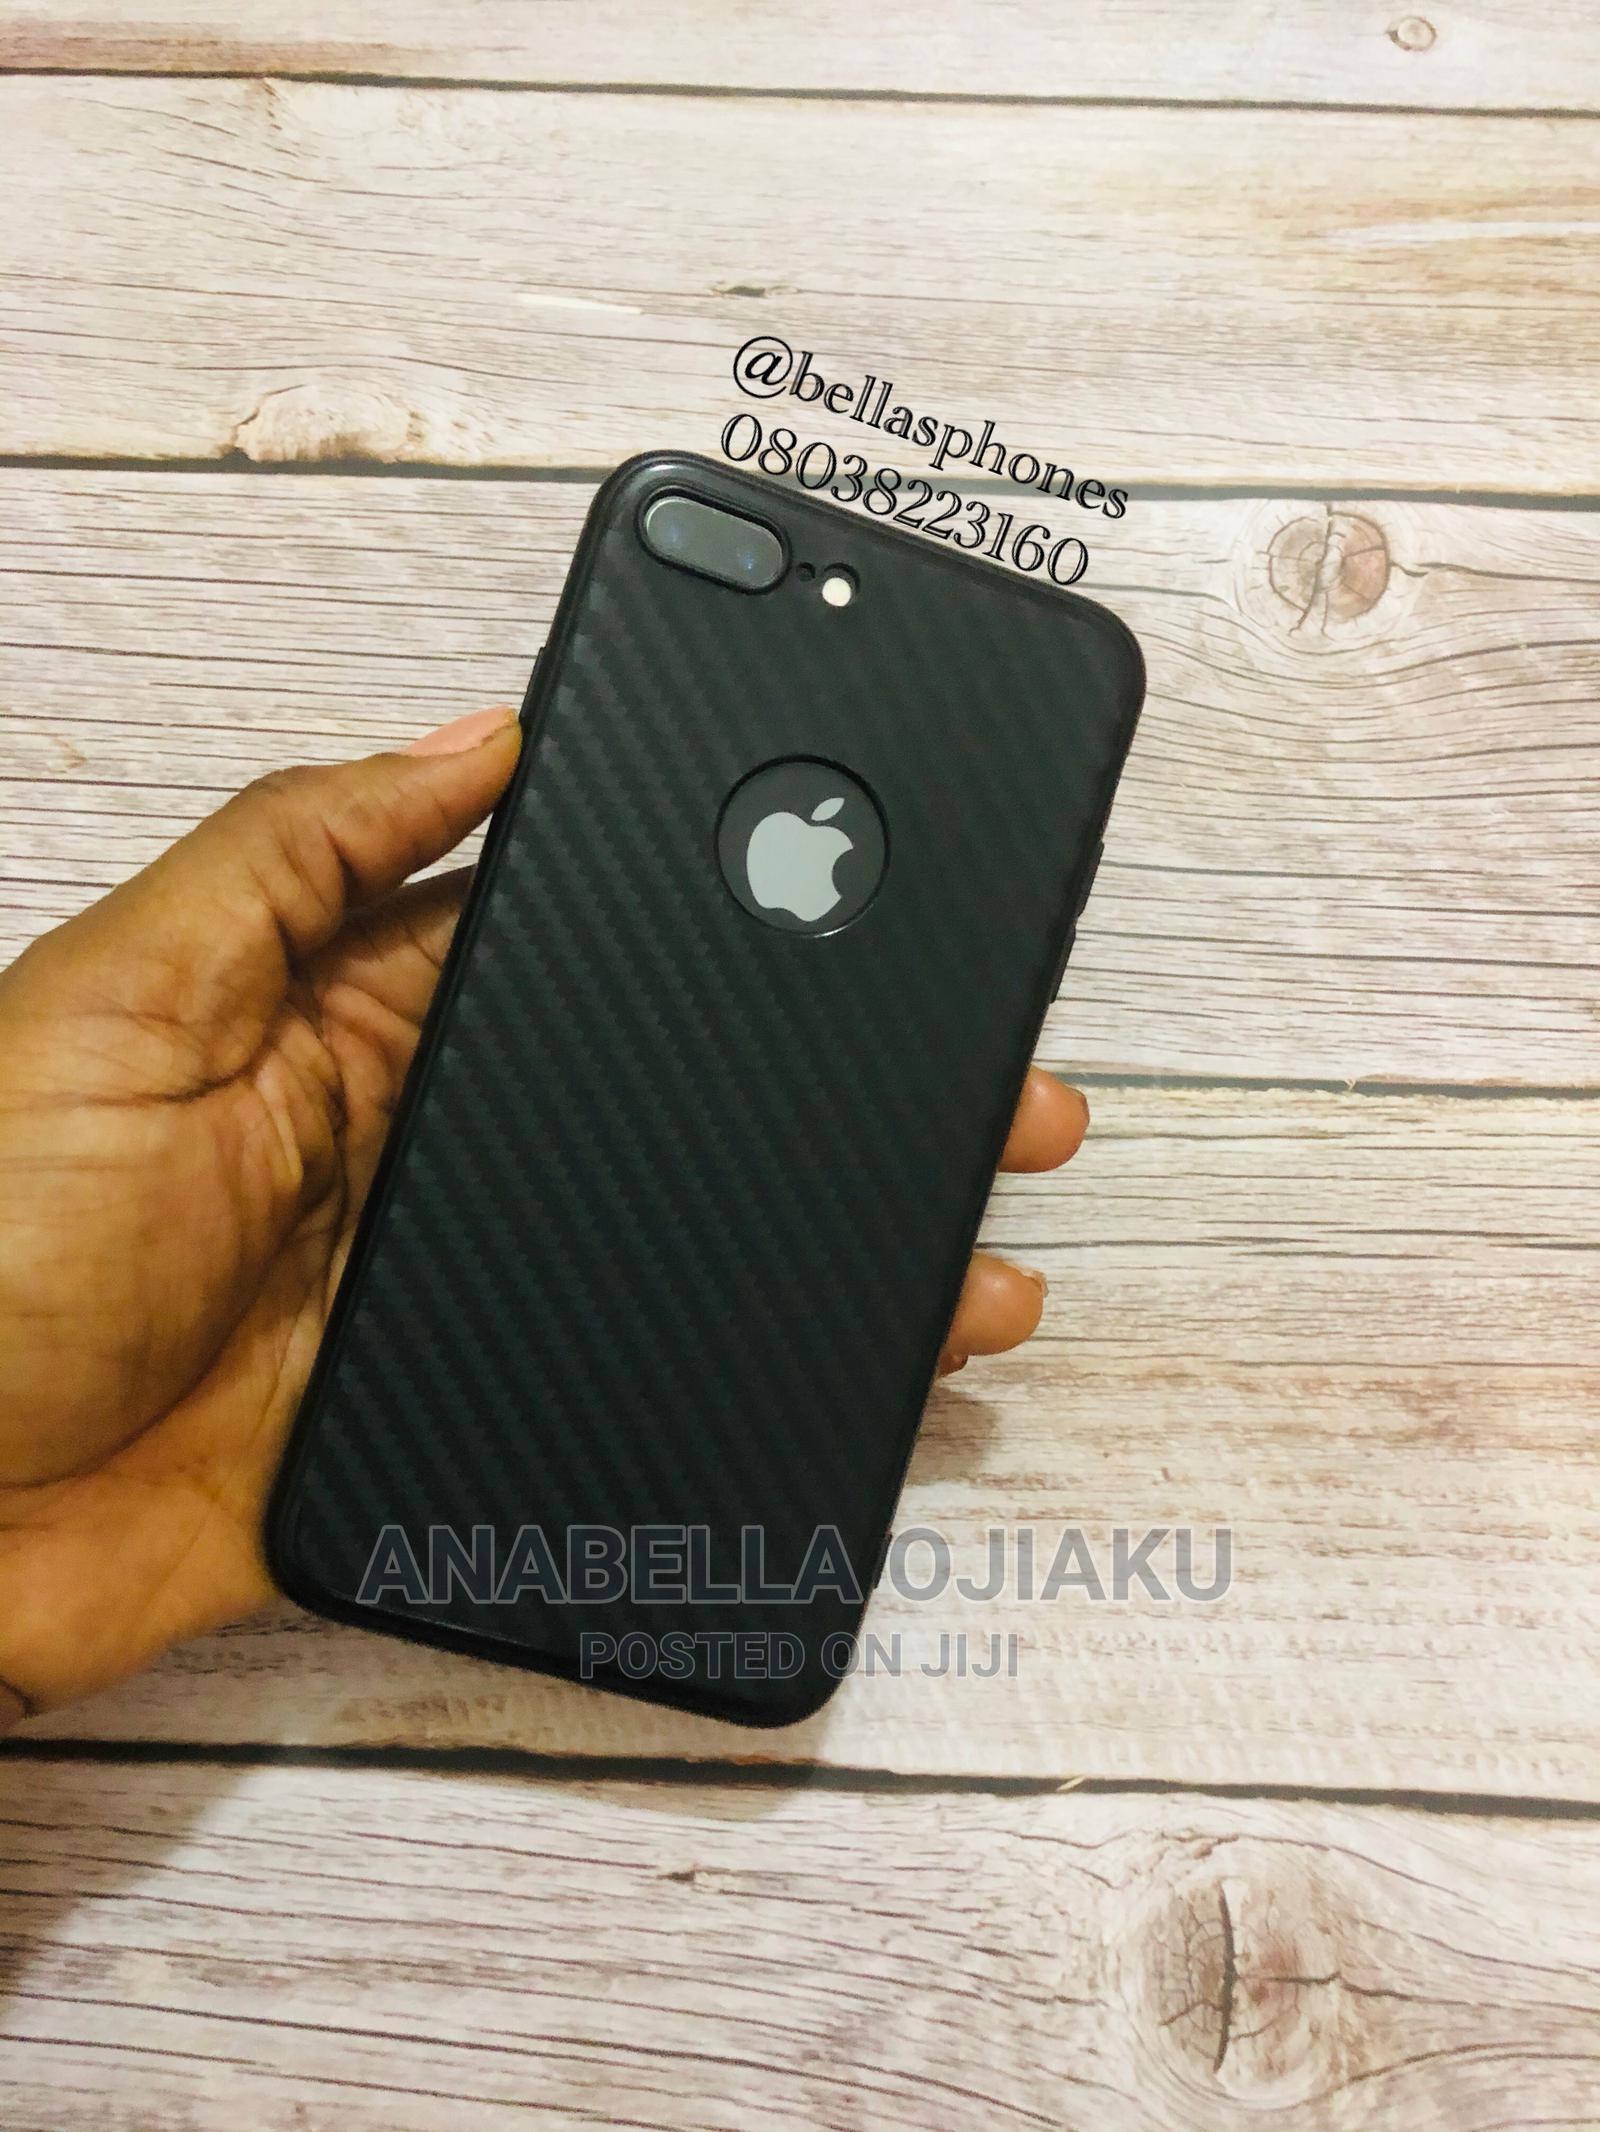 Apple iPhone 8 Plus 64 GB Black | Mobile Phones for sale in Gwarinpa, Abuja (FCT) State, Nigeria